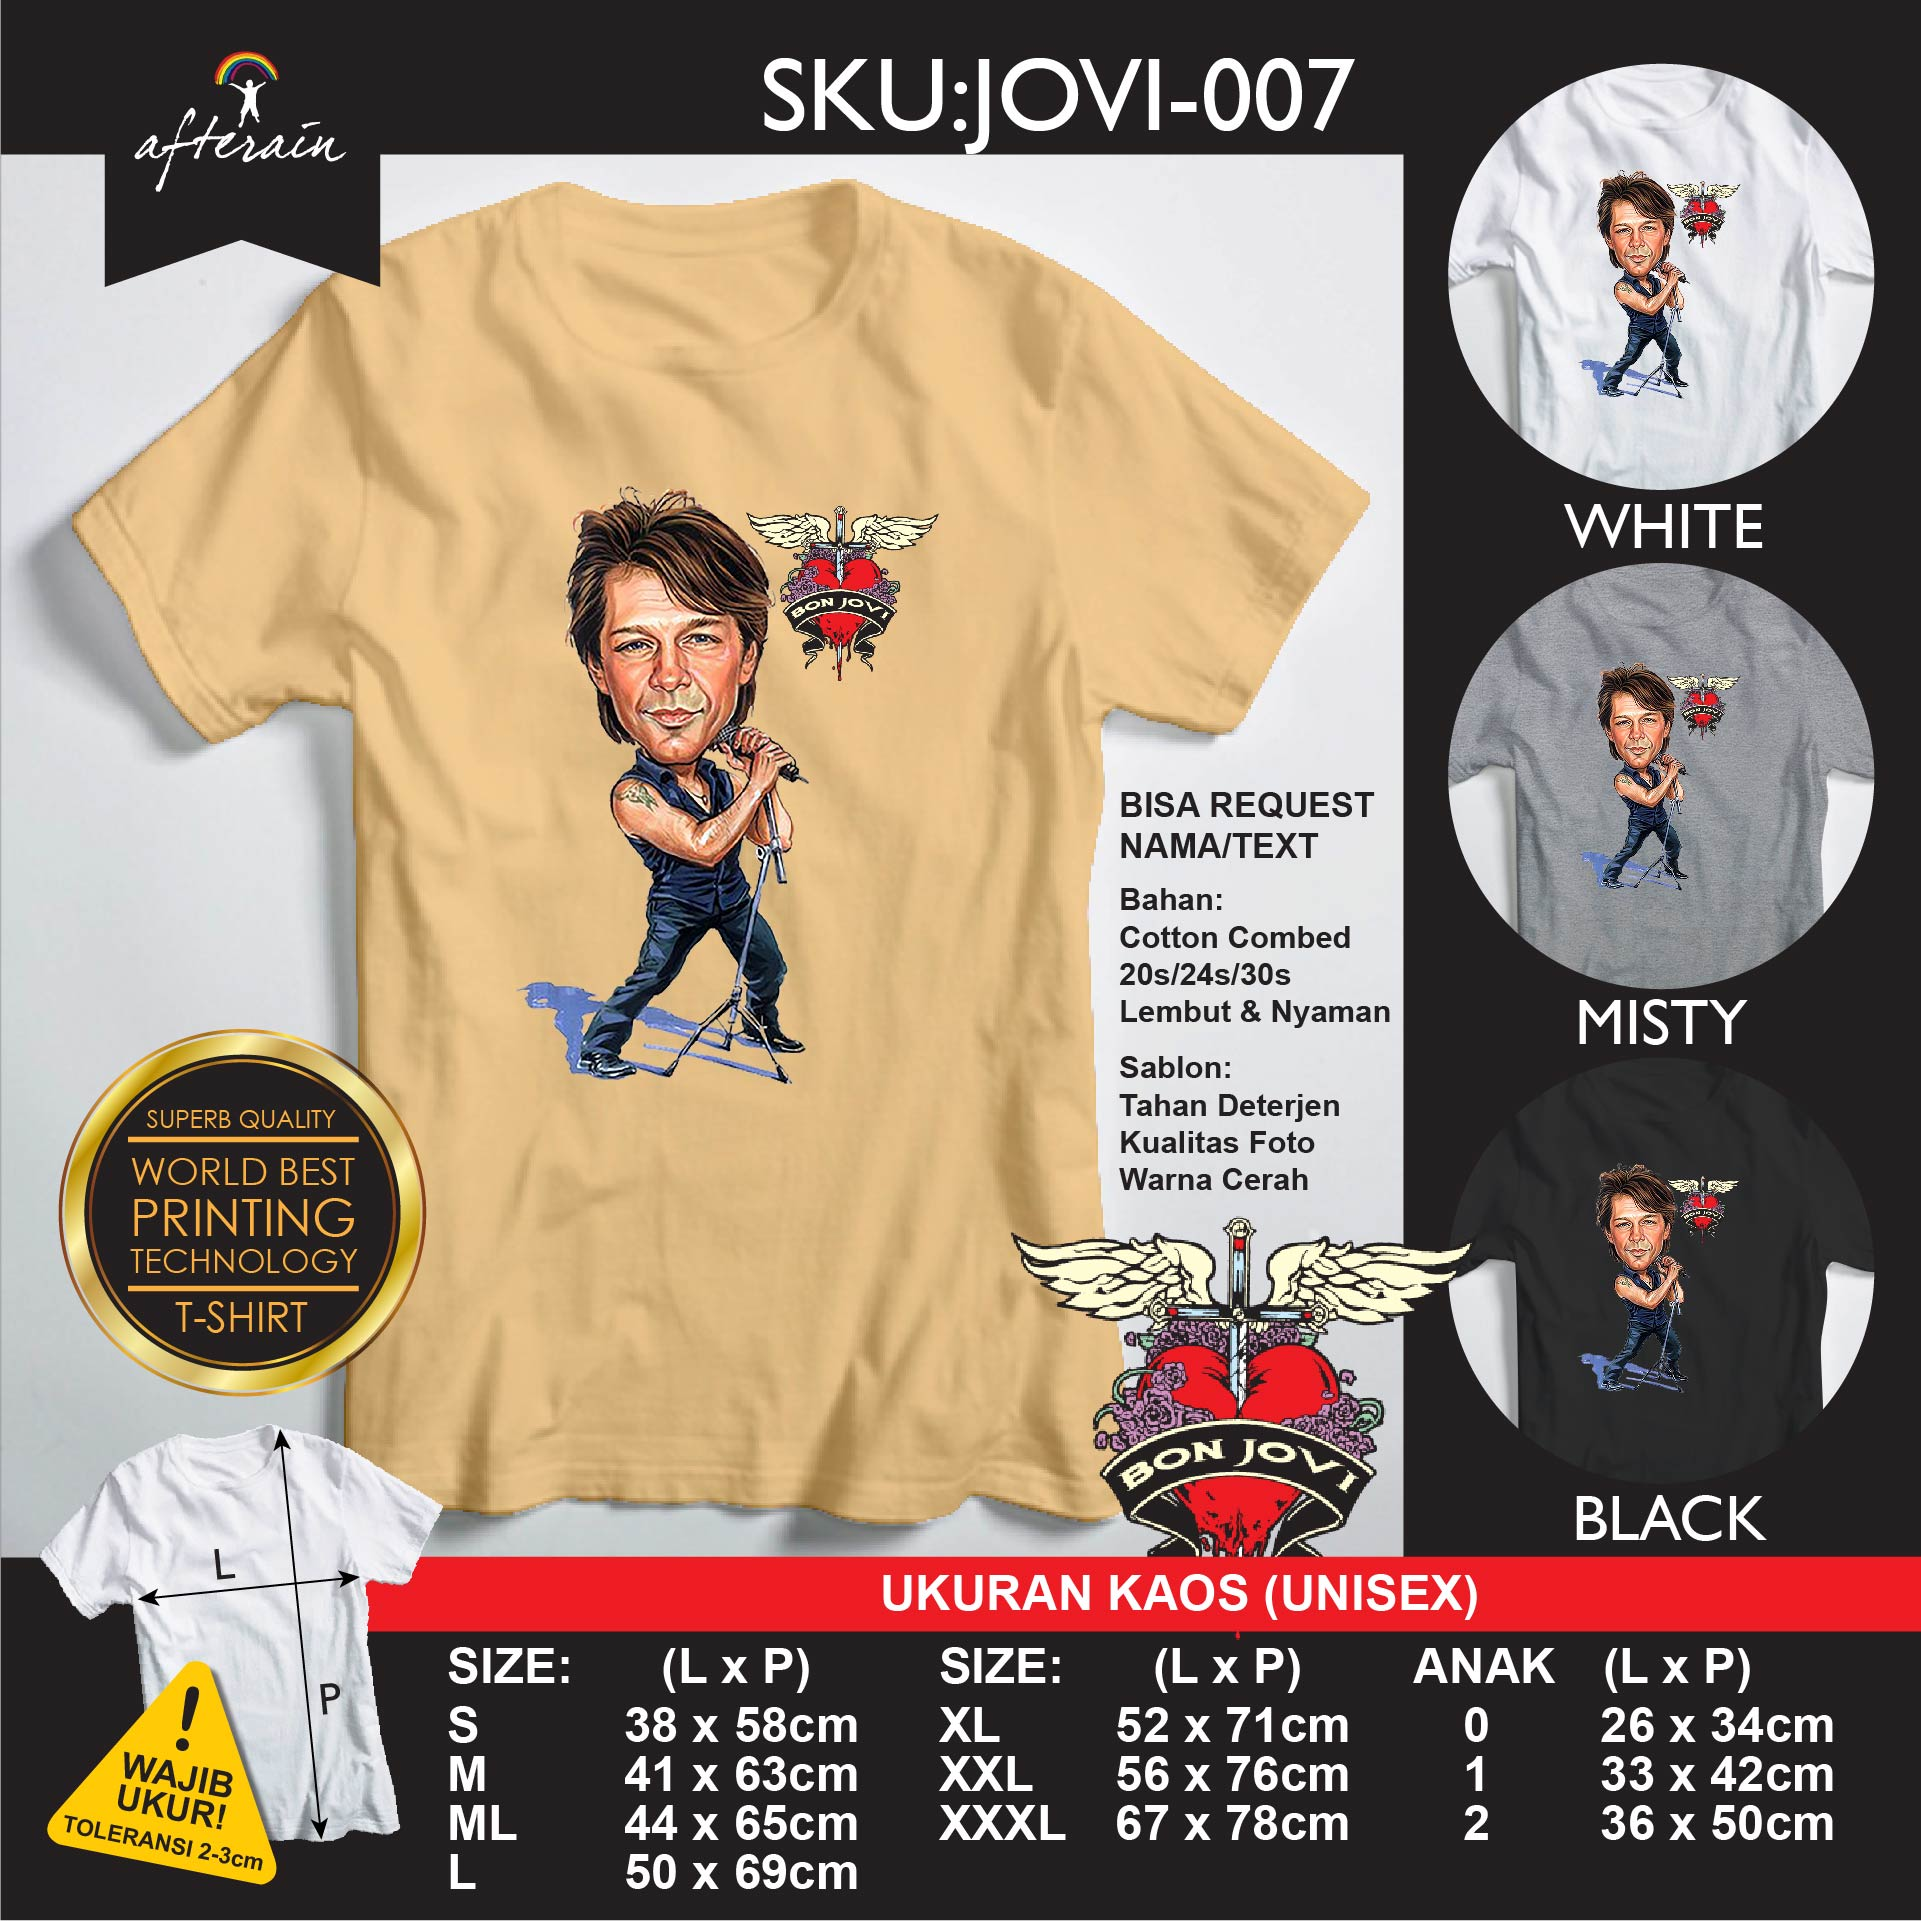 Jual Kaos Bon Jovi Tshirt Distro Bonjovi 07 Anak S M L Xl Ms Beauty Online Store Tokopedia